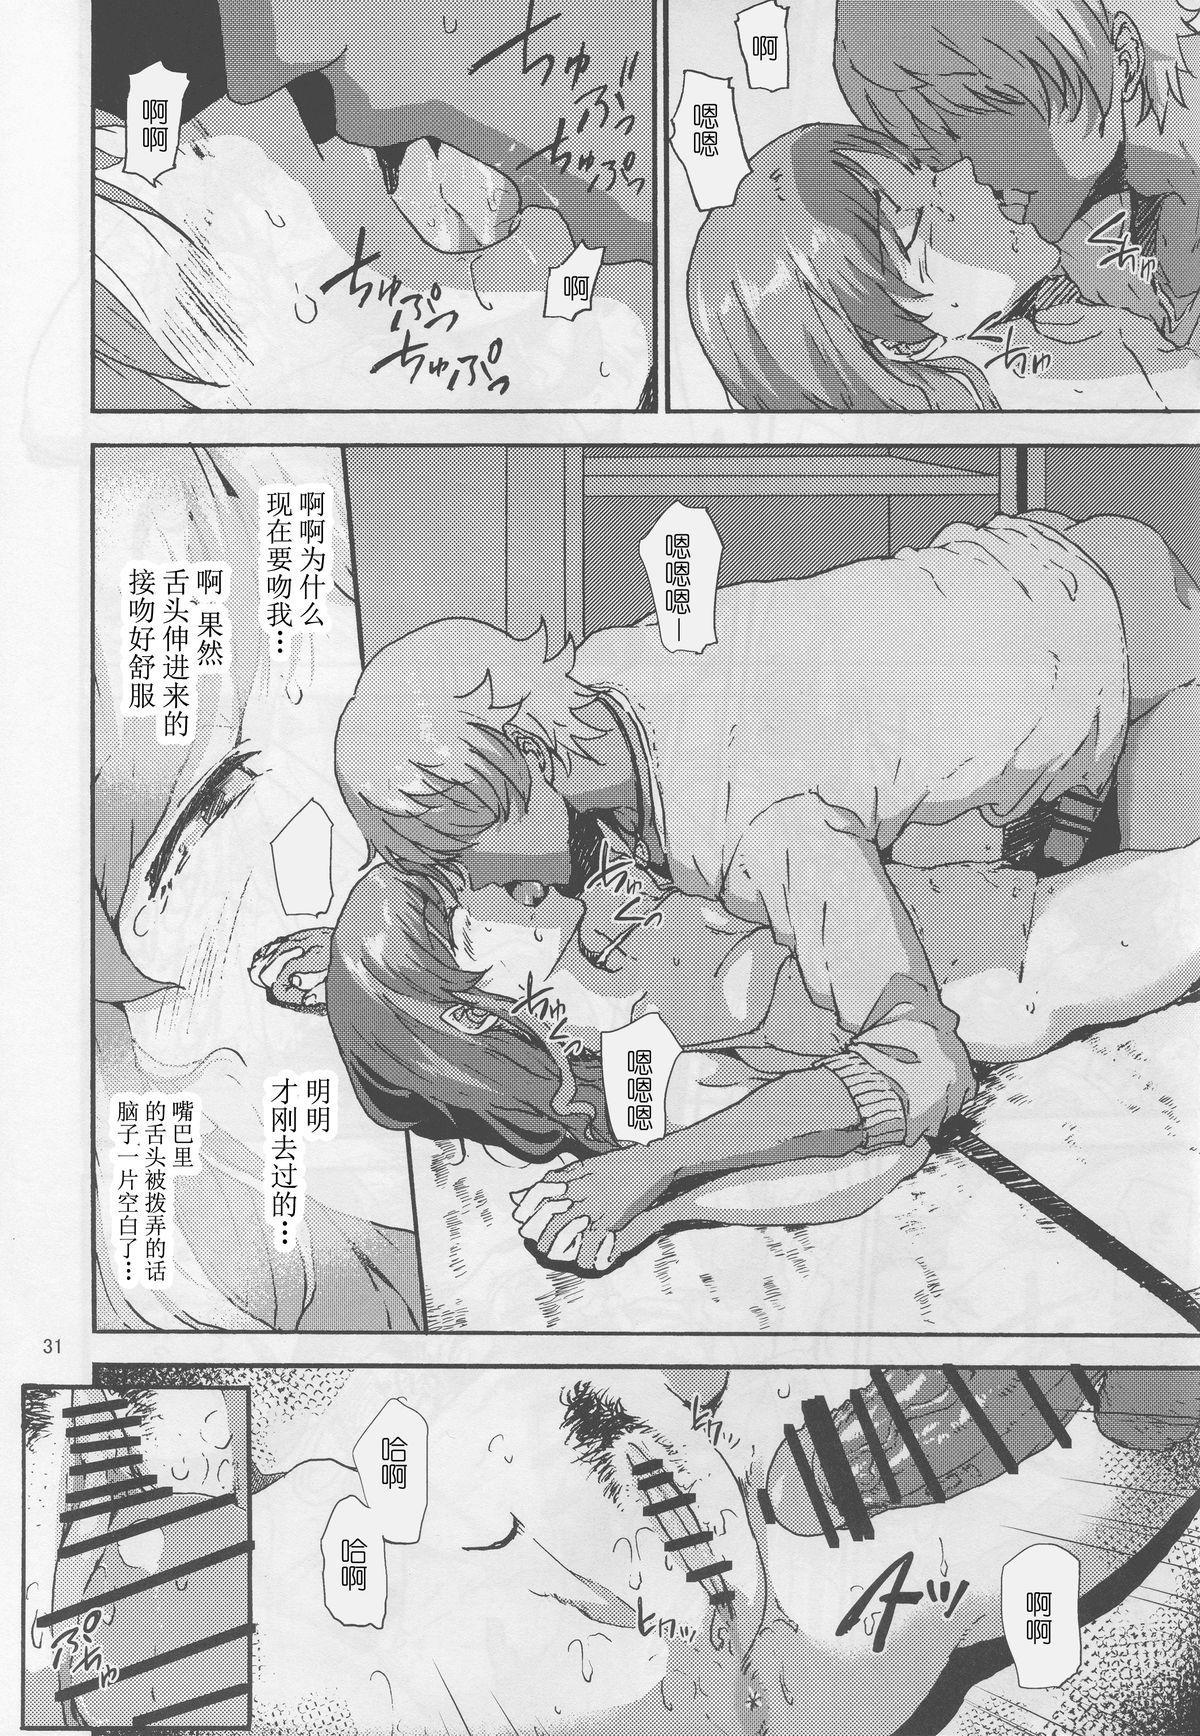 Mirai-chan ga Sandaime SGOCK no Leader ni Damasare Yarechau Hon 31